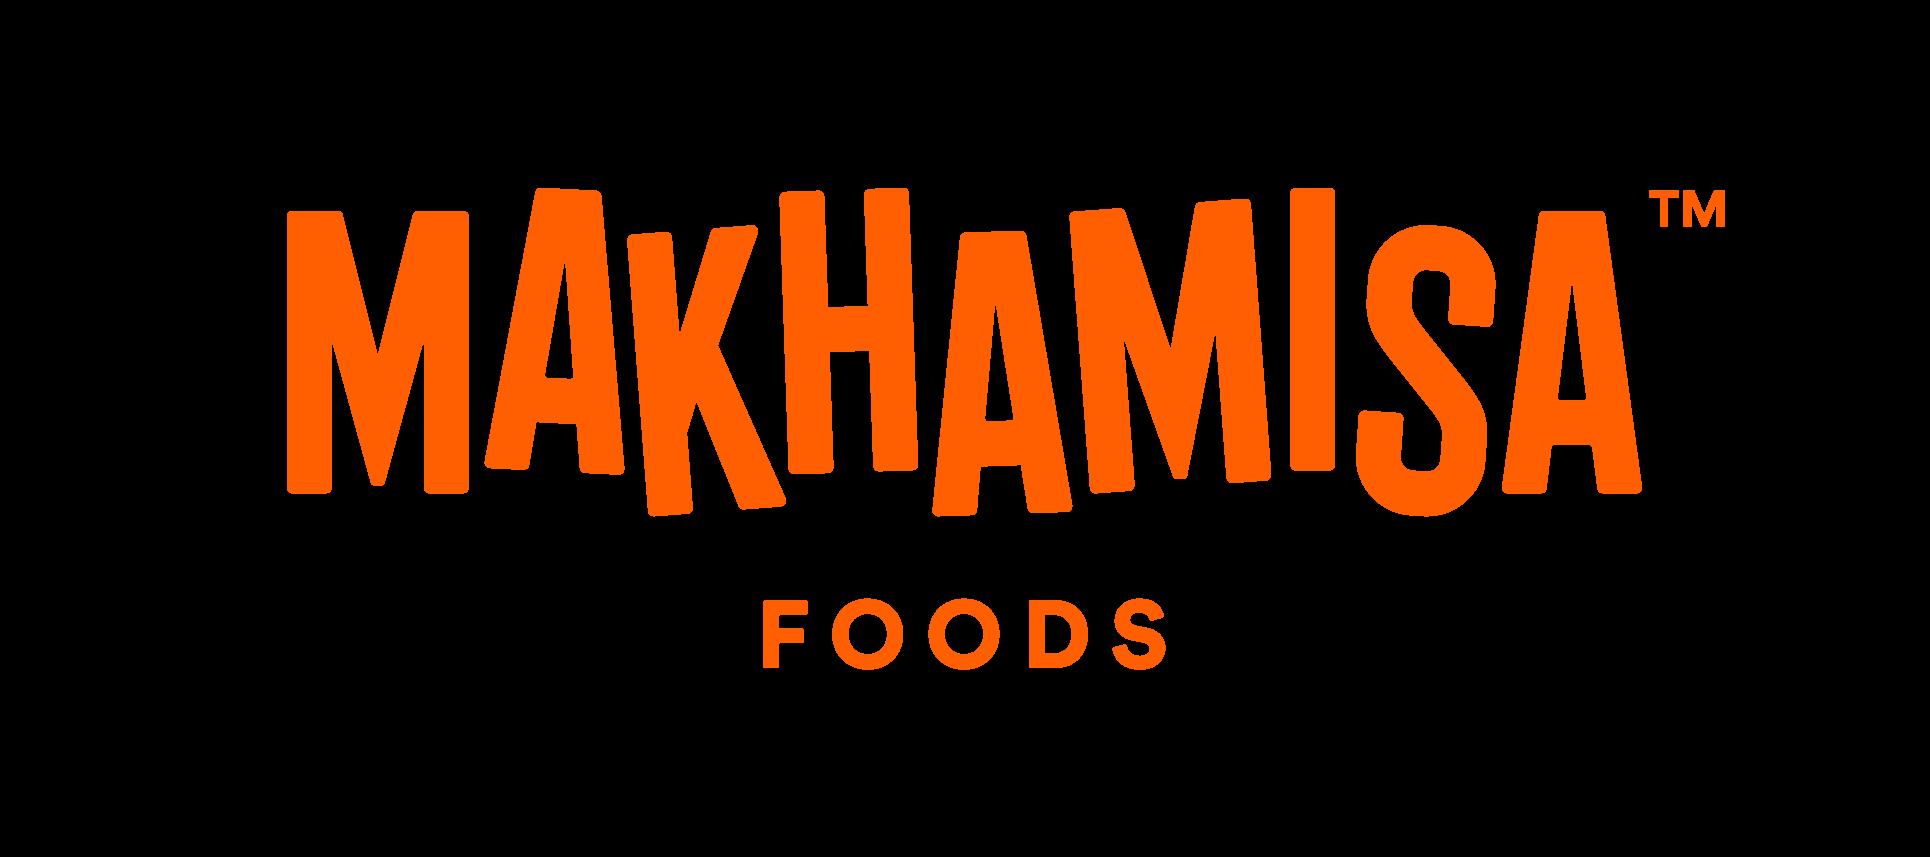 Makhamisa